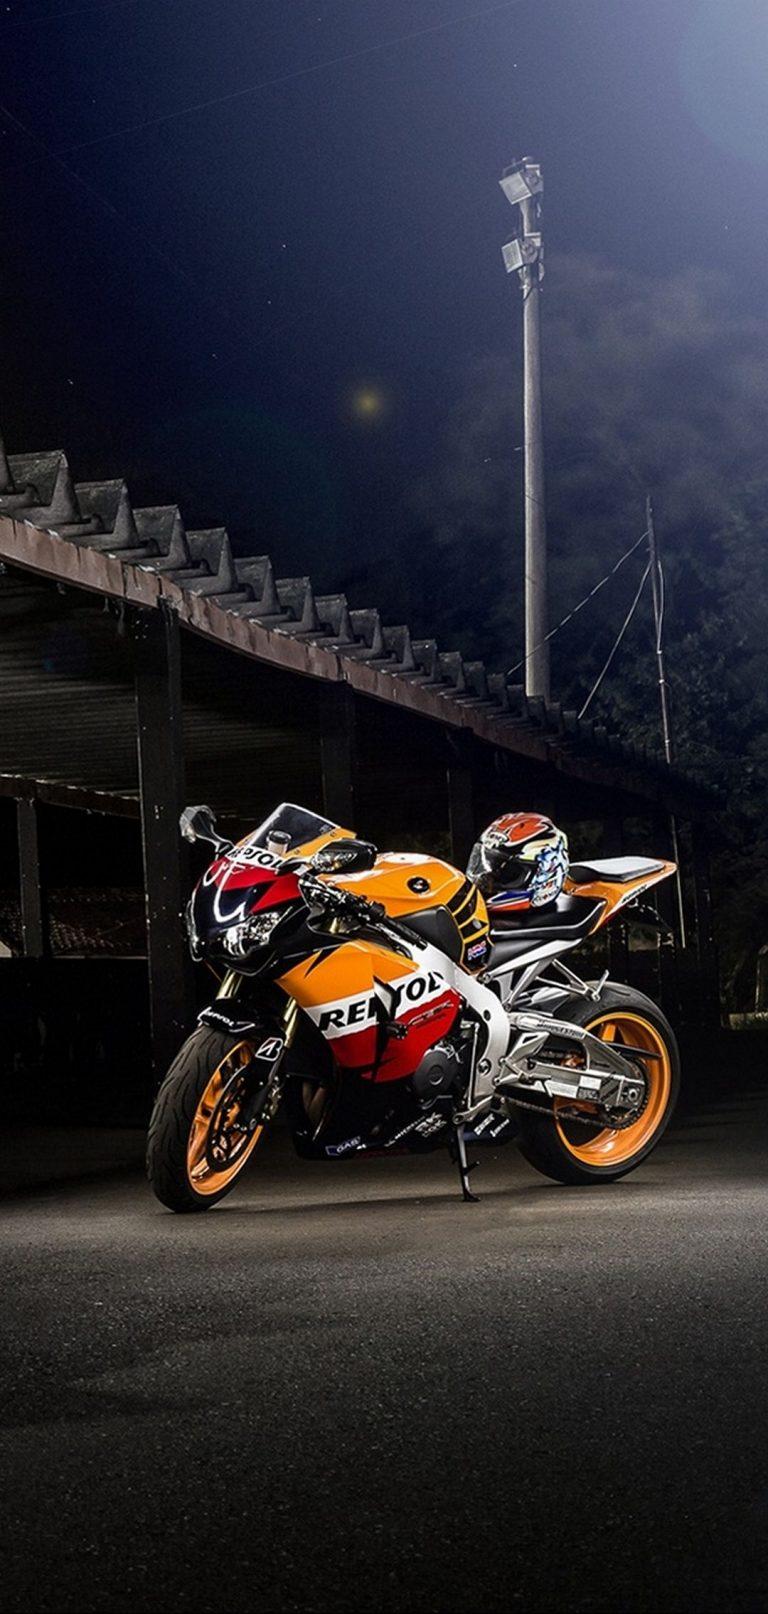 Honda Cbr1000rr Repsol Motorcycle Bike 1080x2270 768x1614